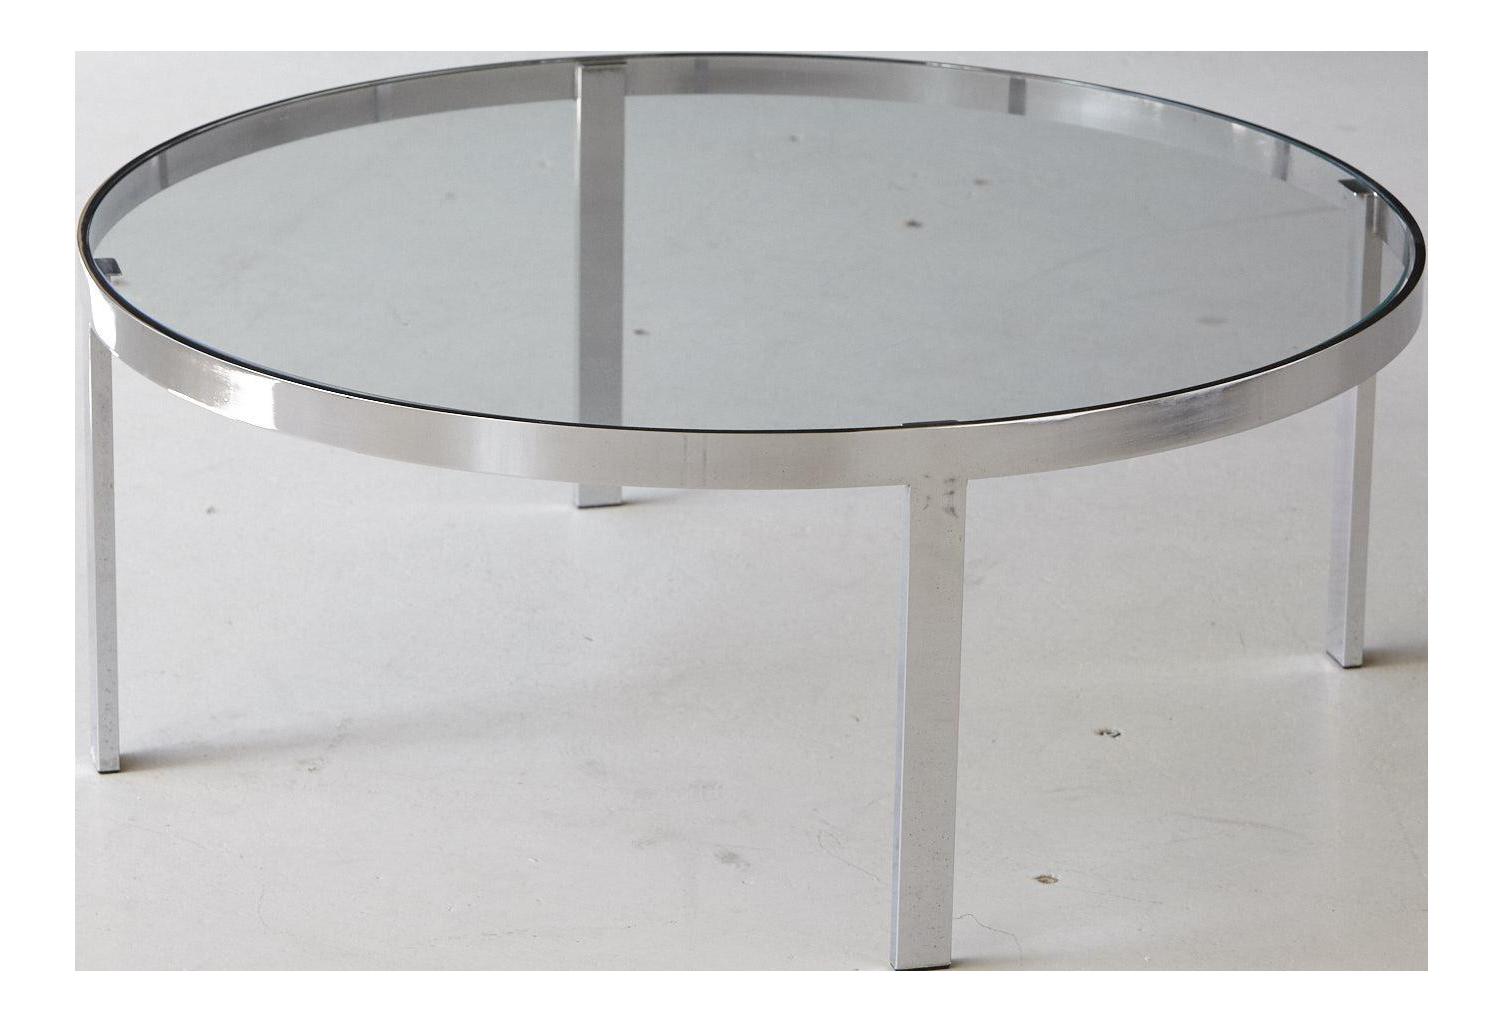 Beau Milo Baughman Round Chrome And Glass Coffee Table For Sale